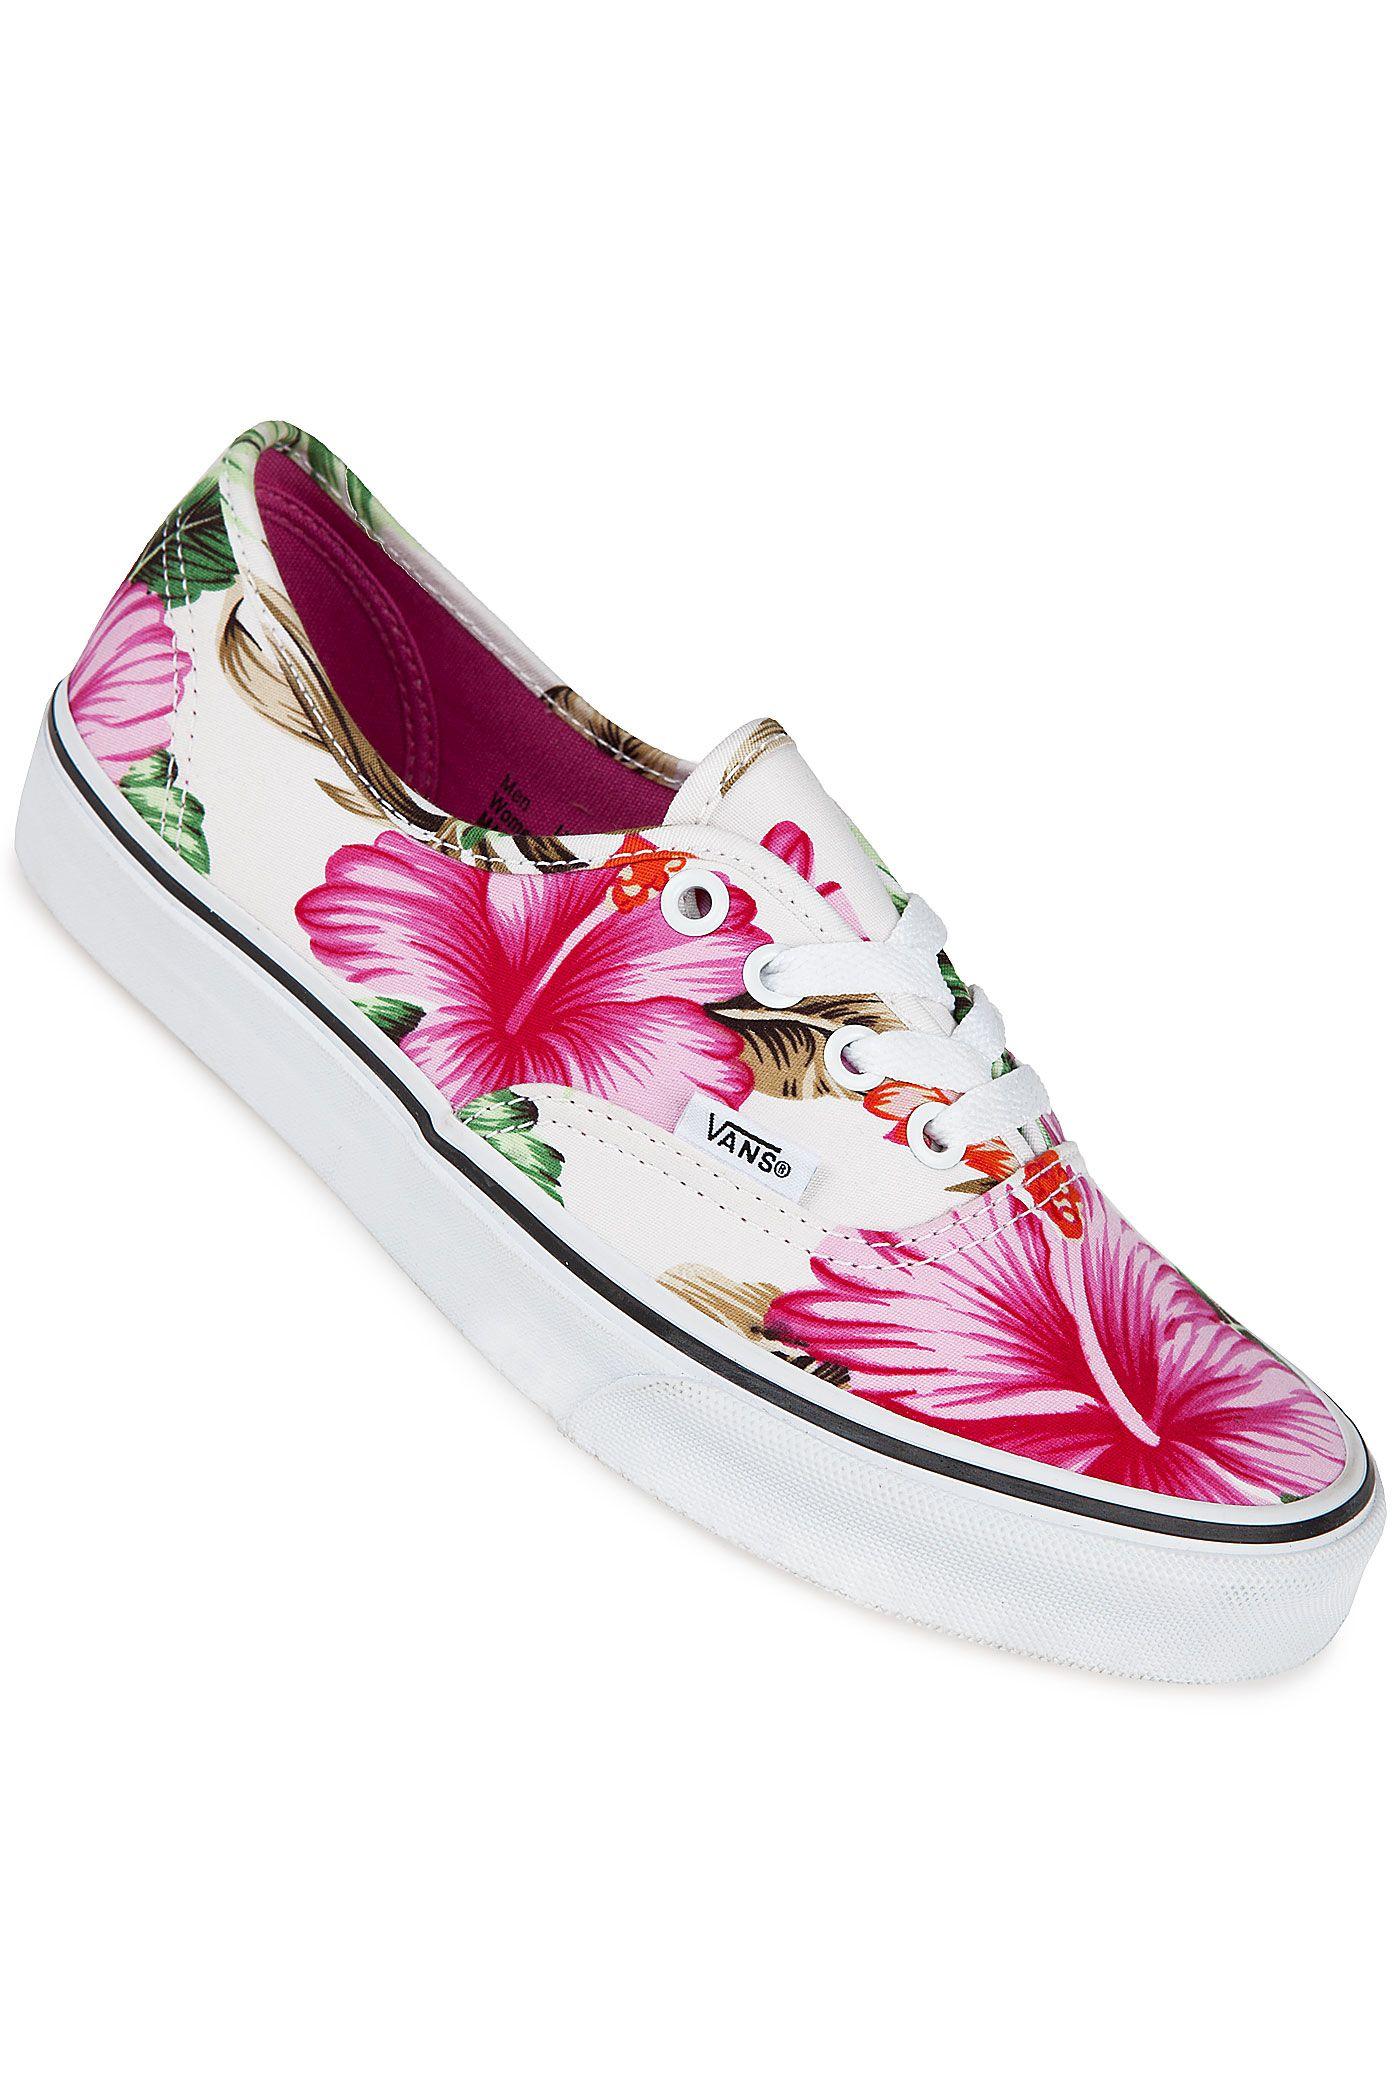 bb7503156618e5 Vans Unisex Hawaiian Floral Skateboarding Shoes-Hawaiian Floral ...